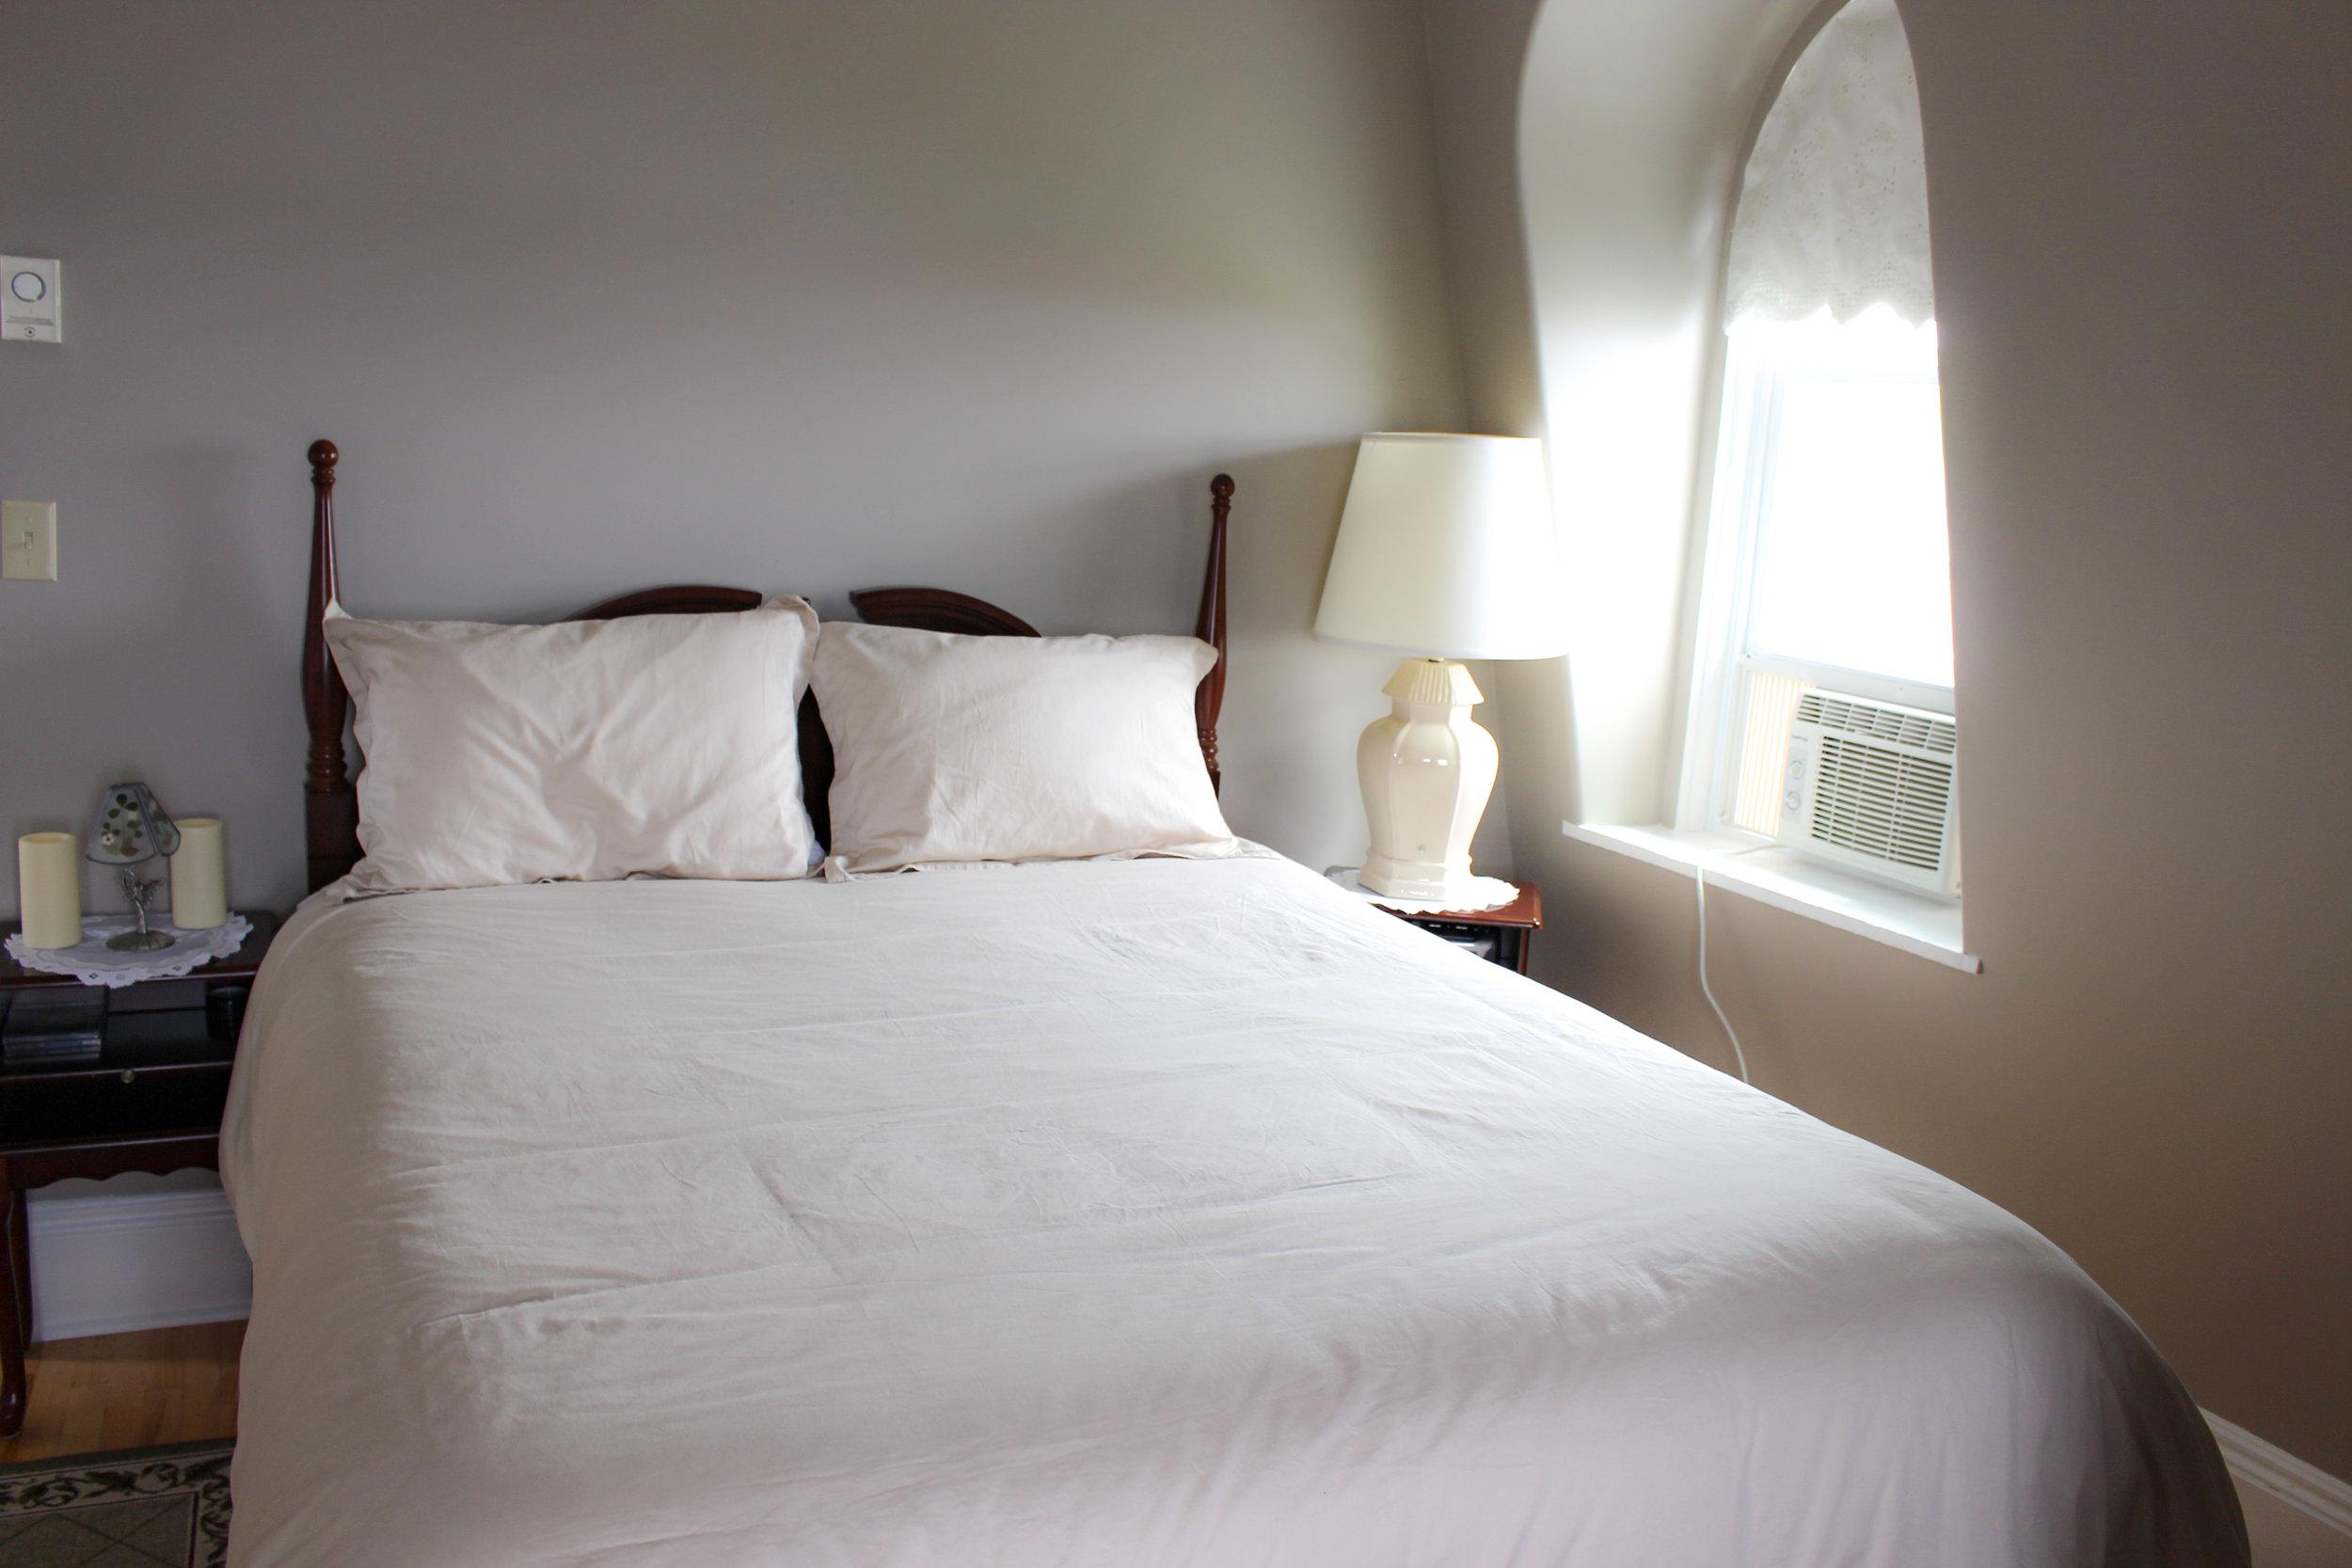 303 Colville Bay Room - Price $189.75/Night